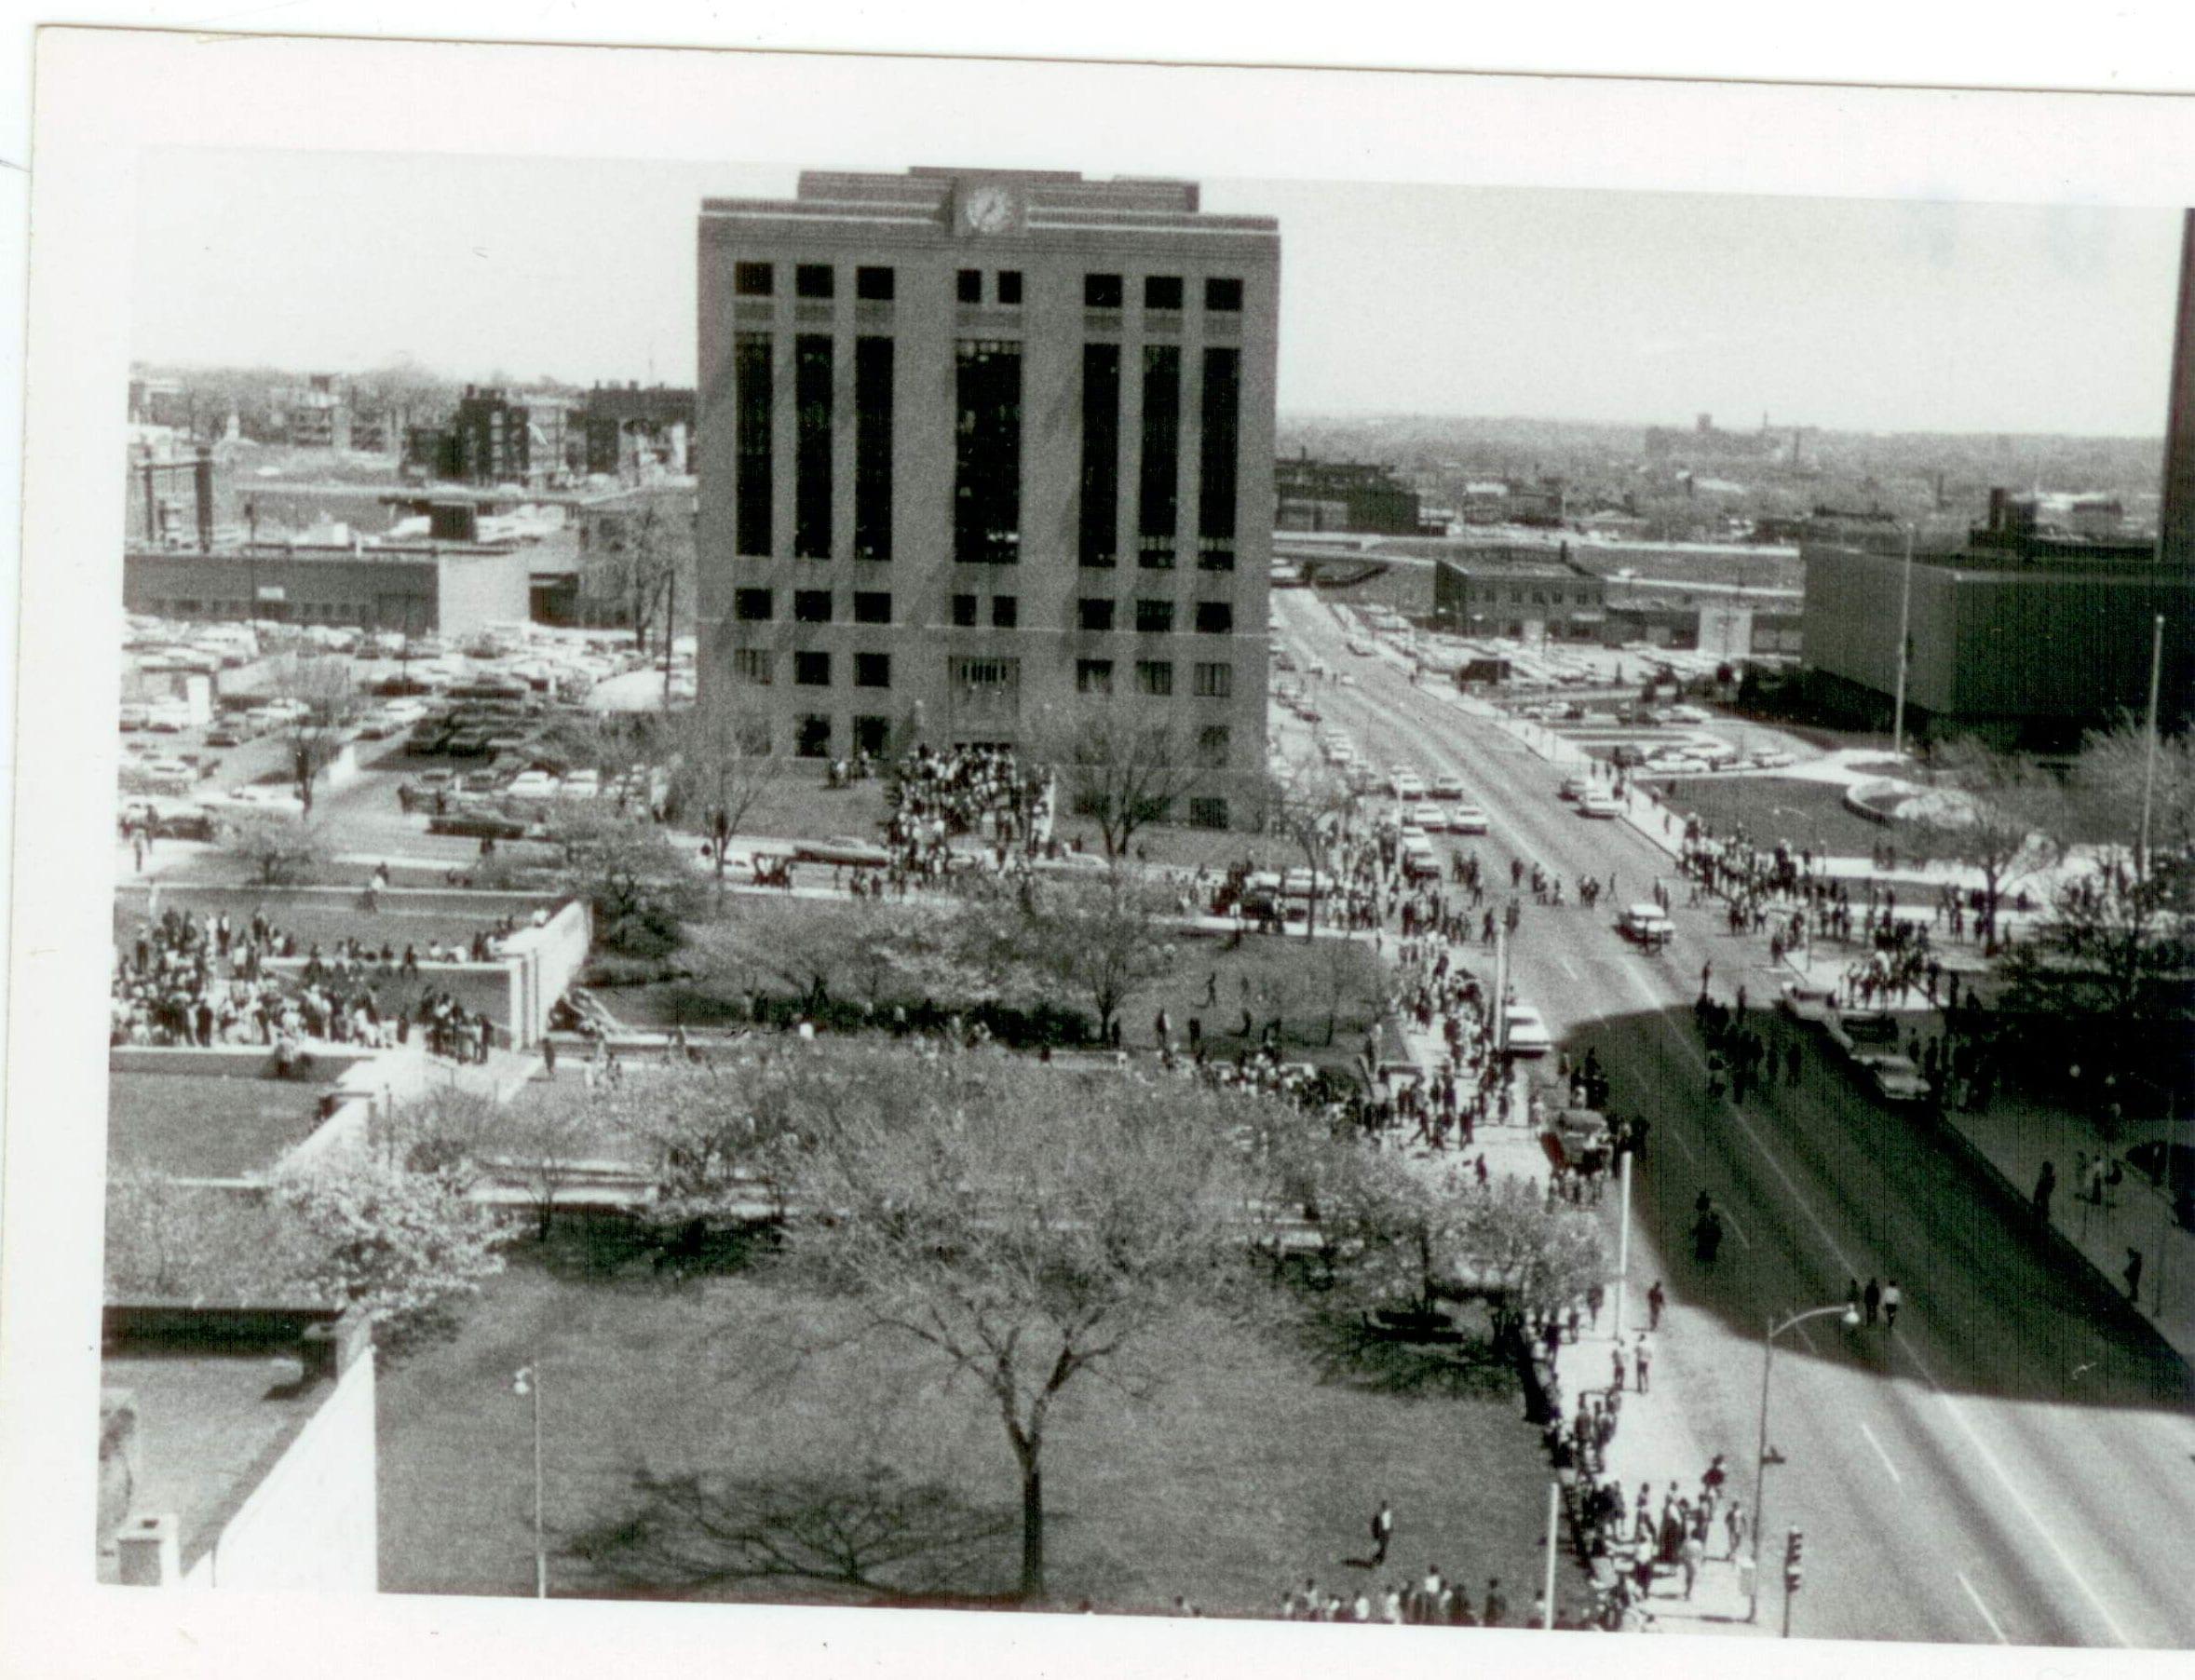 Kansas City 1968 Photos Of Mlk Assassination Protest Found